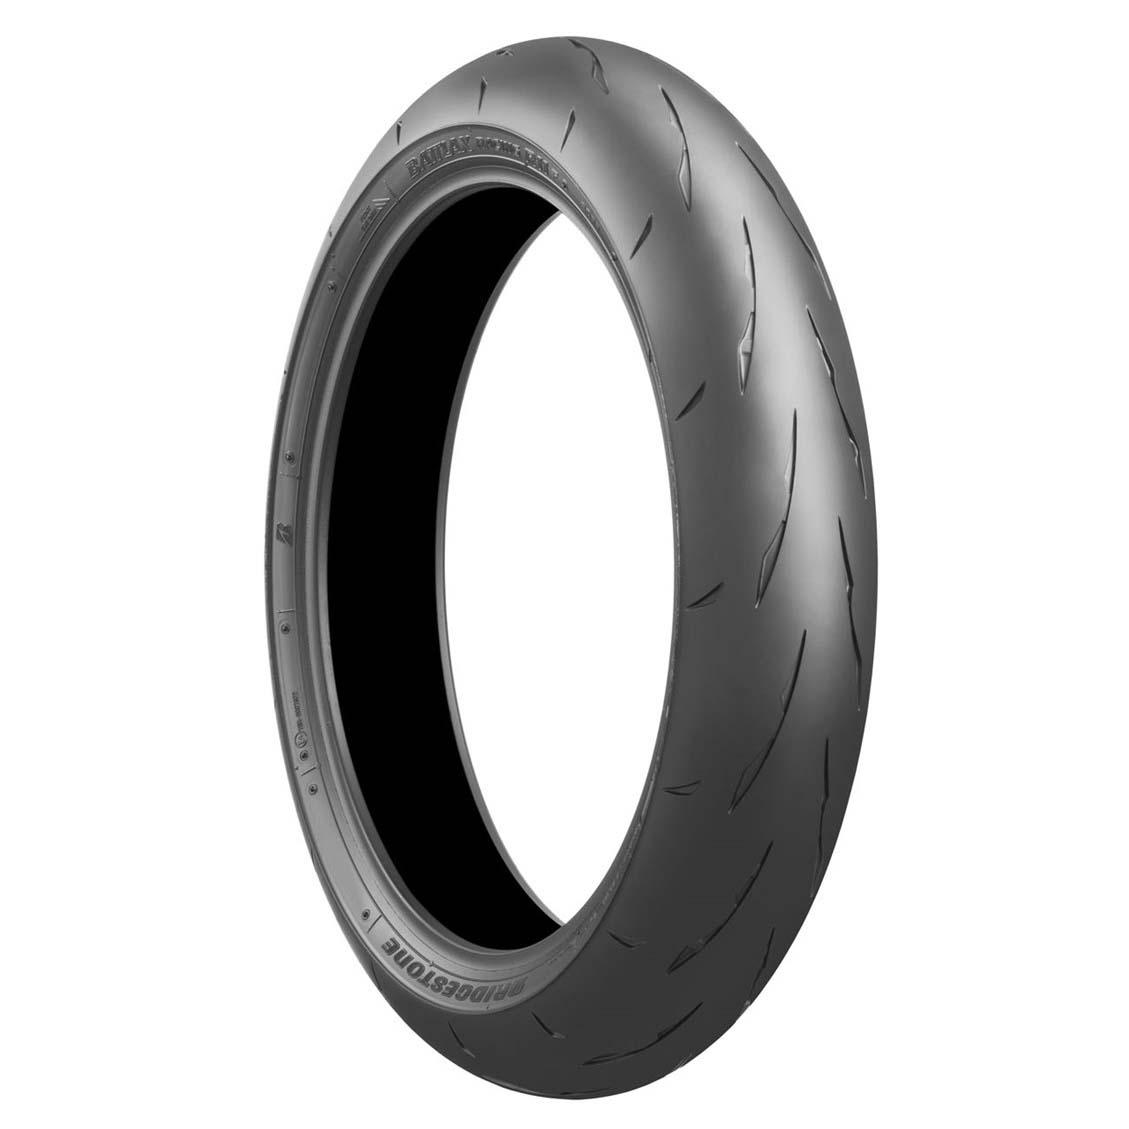 Bridgestone R11 Front Race Tyre 120/70/17 Soft